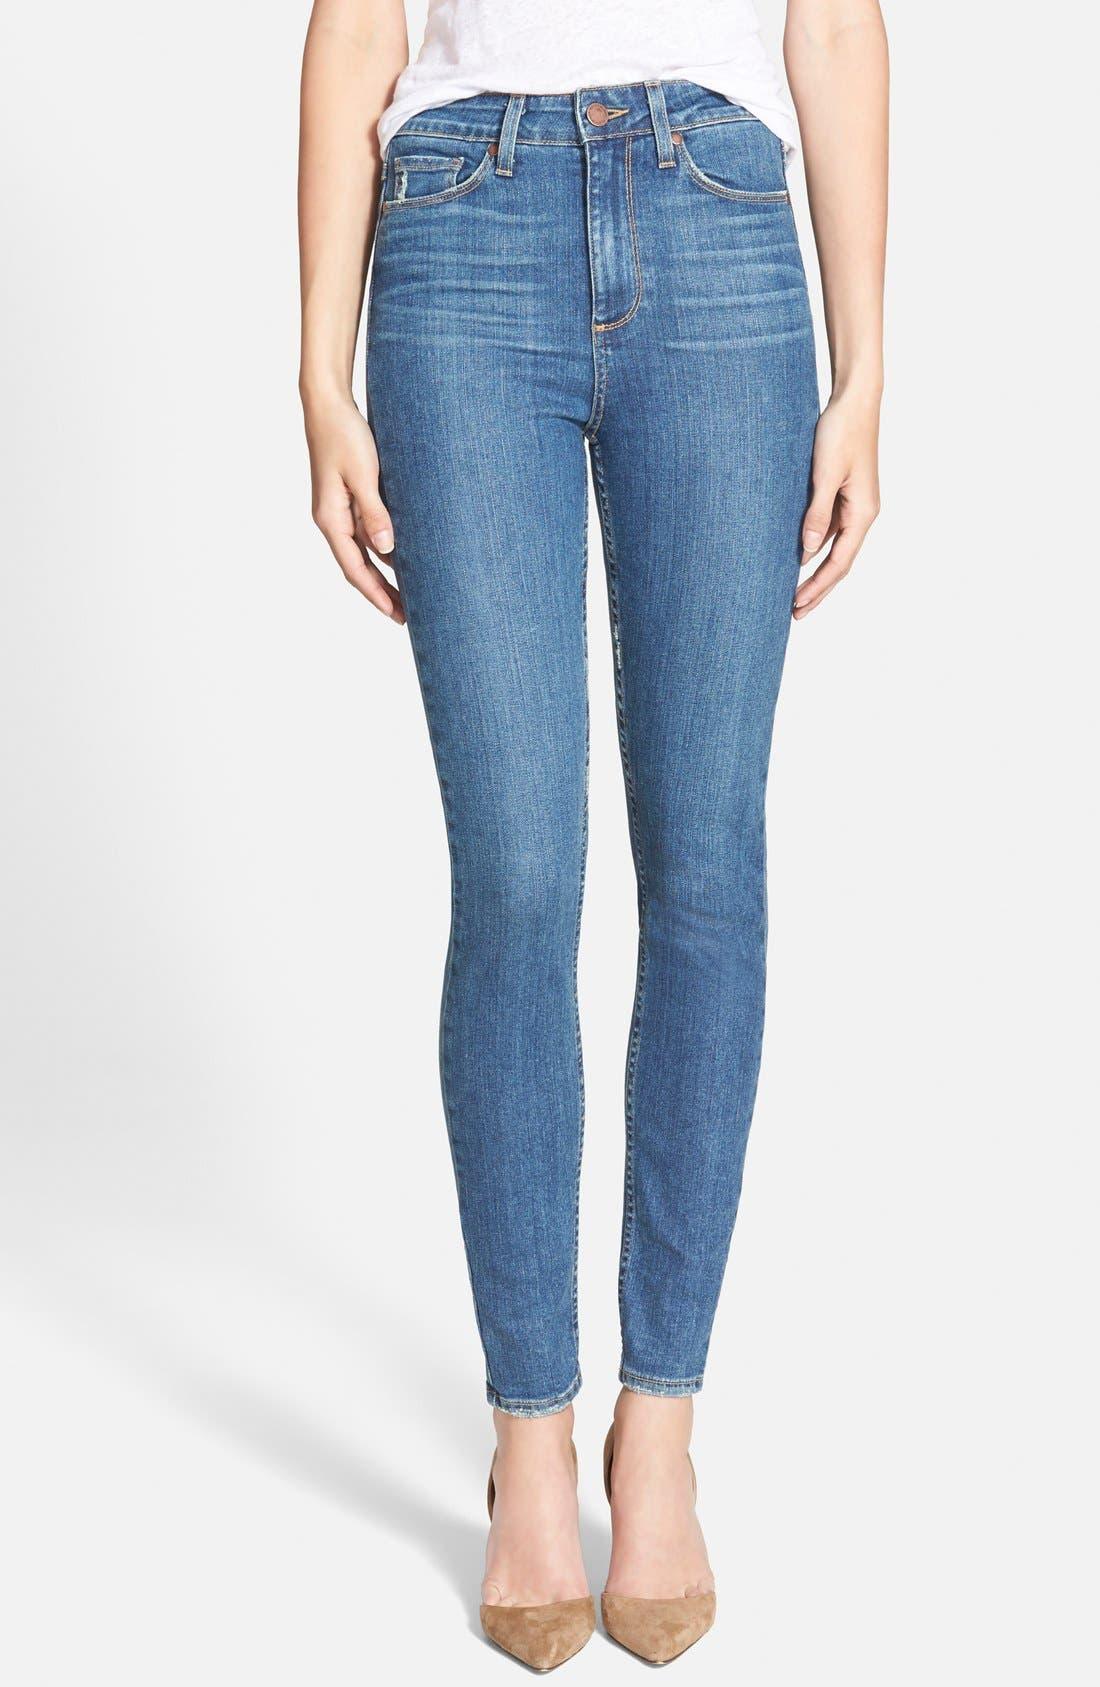 Main Image - Paige Denim 'Margo' High Rise Ultra Skinny Jeans (Mira)